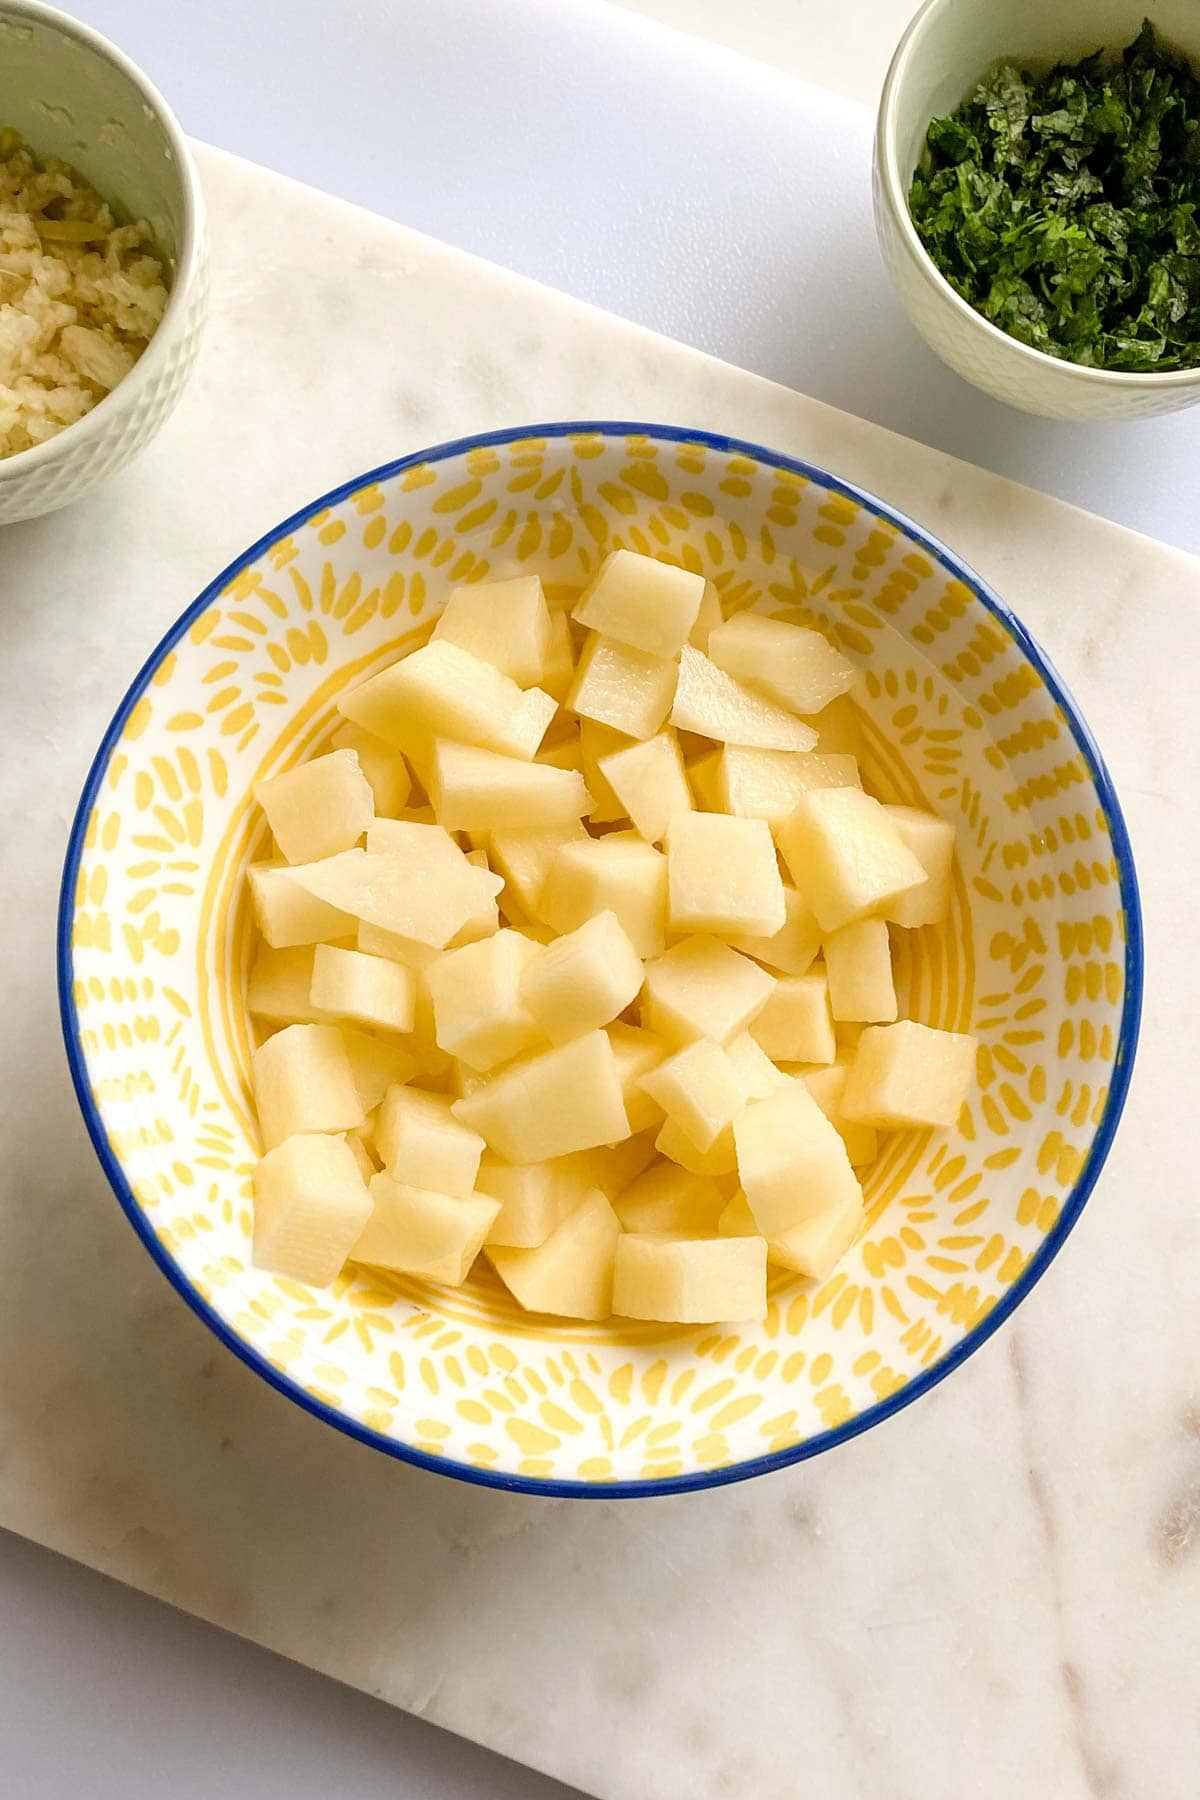 chopped potatoes in a bowl